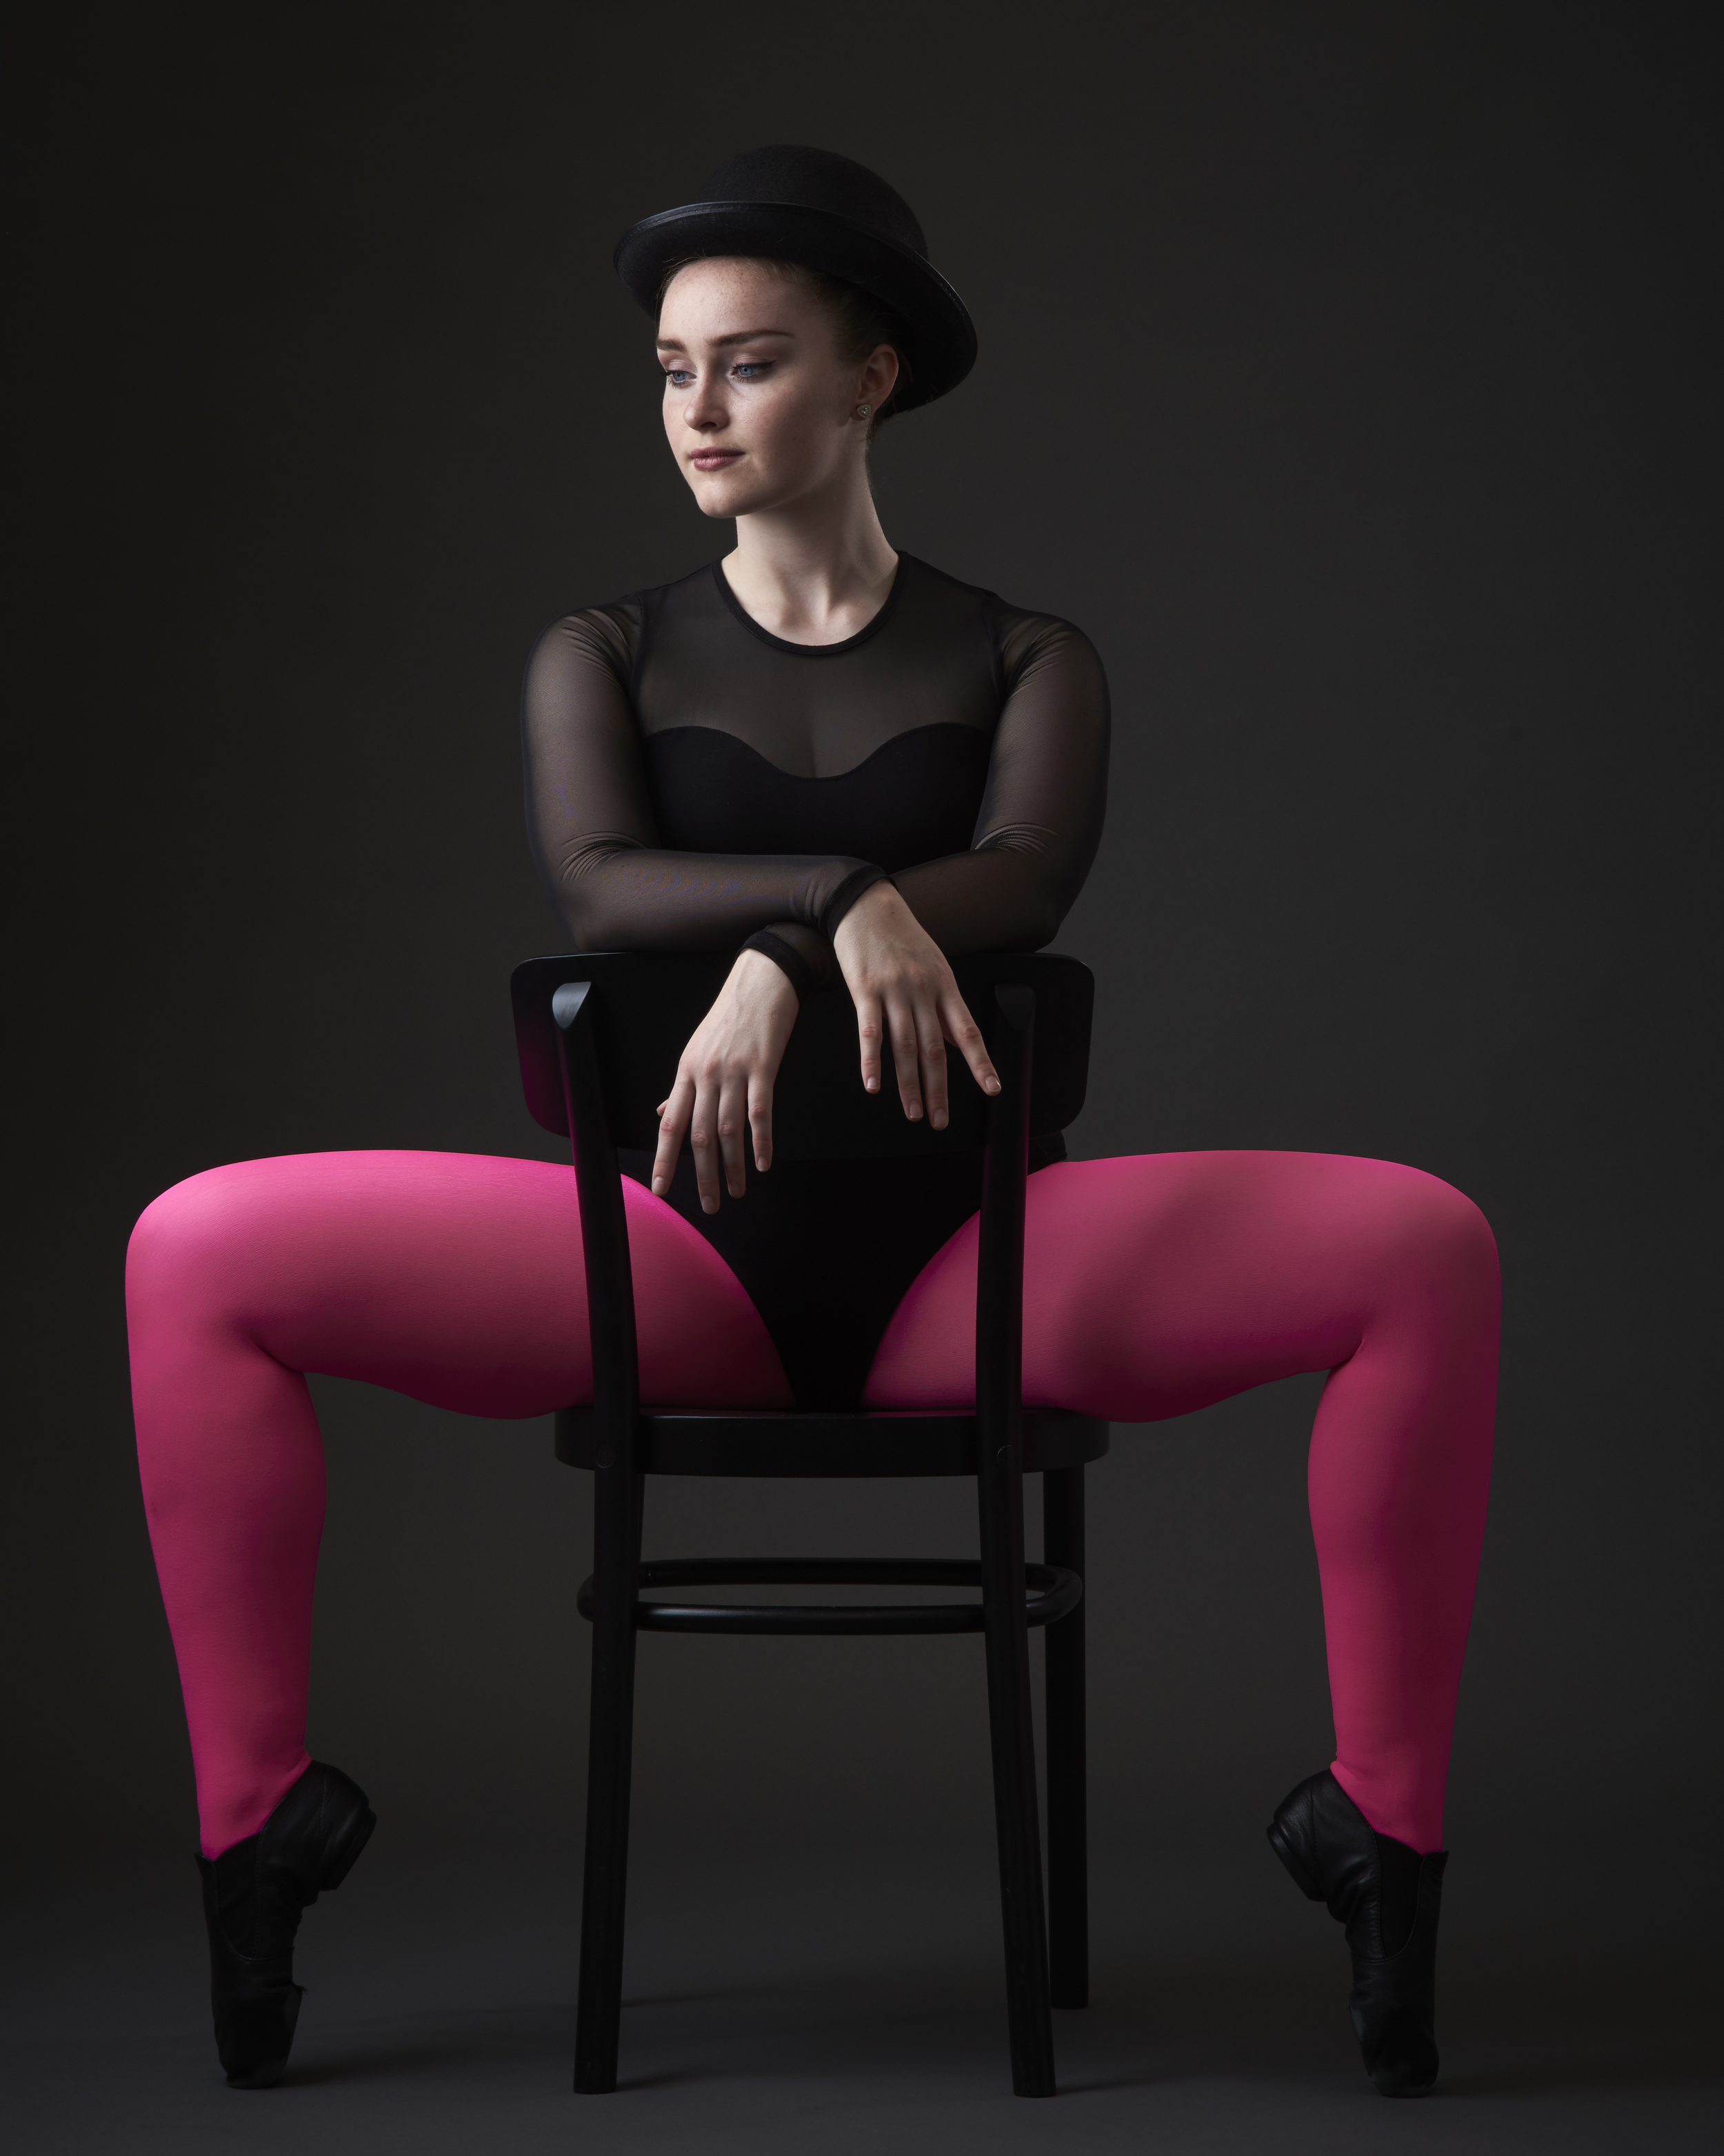 FotoFun Elise Phillipi Ballet_DSC2922_PSD_HR.jpg